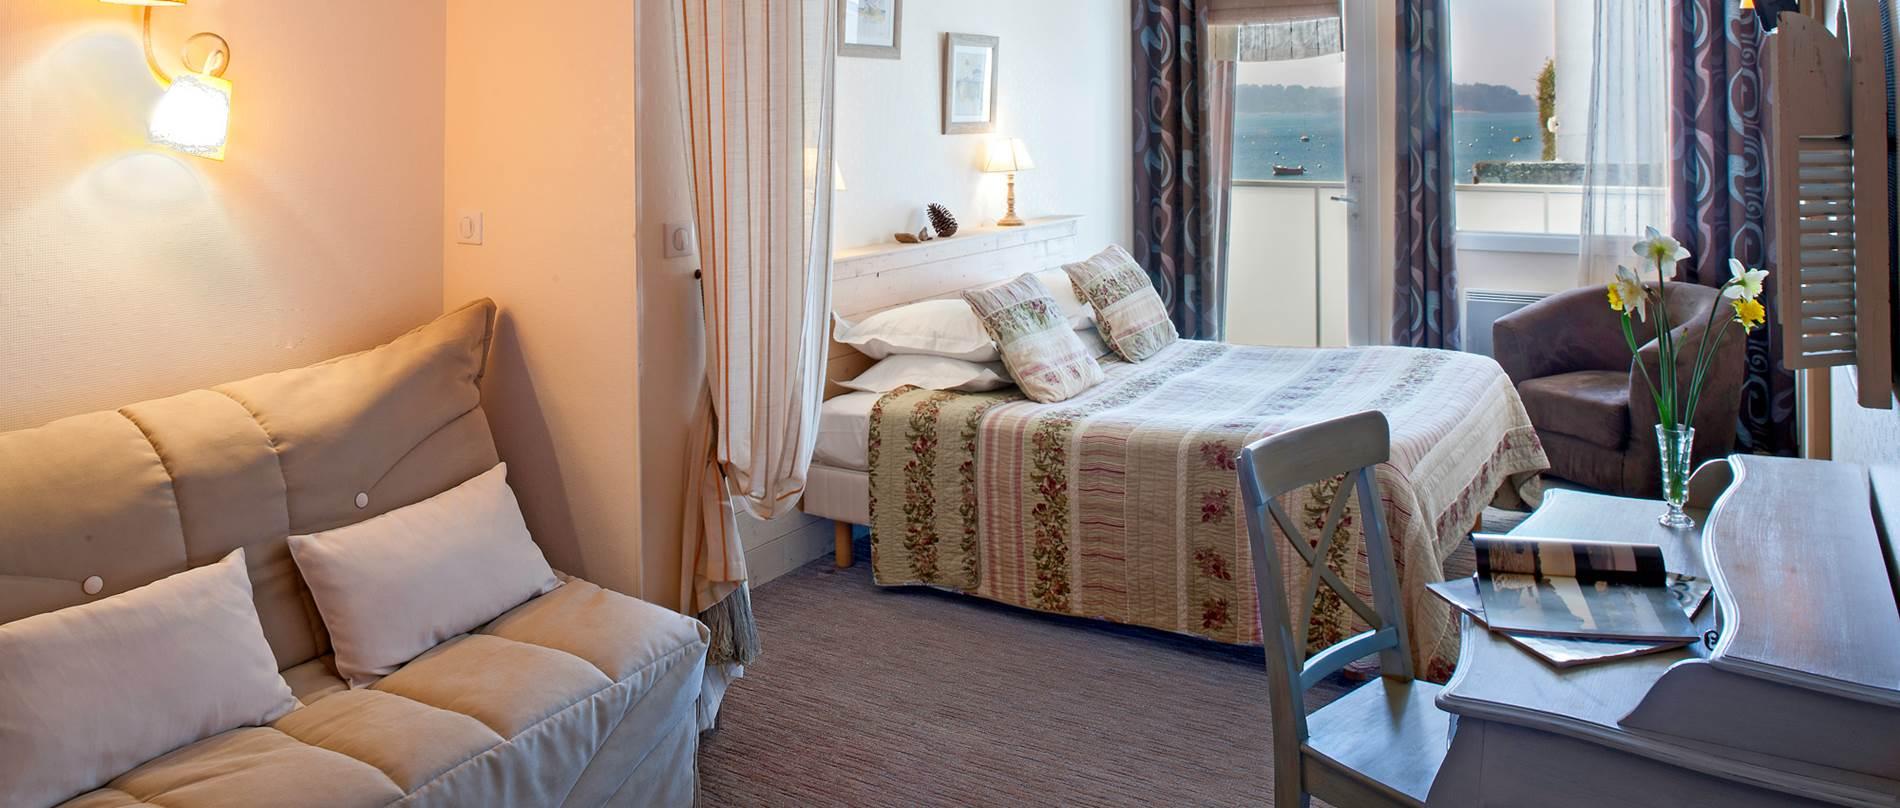 Hotel-Le-Parc-Fetan-Larmor-Baden-Morbihan-Bretagne-Sud © Hotel-Le-Parc-Fetan-Larmor-Baden